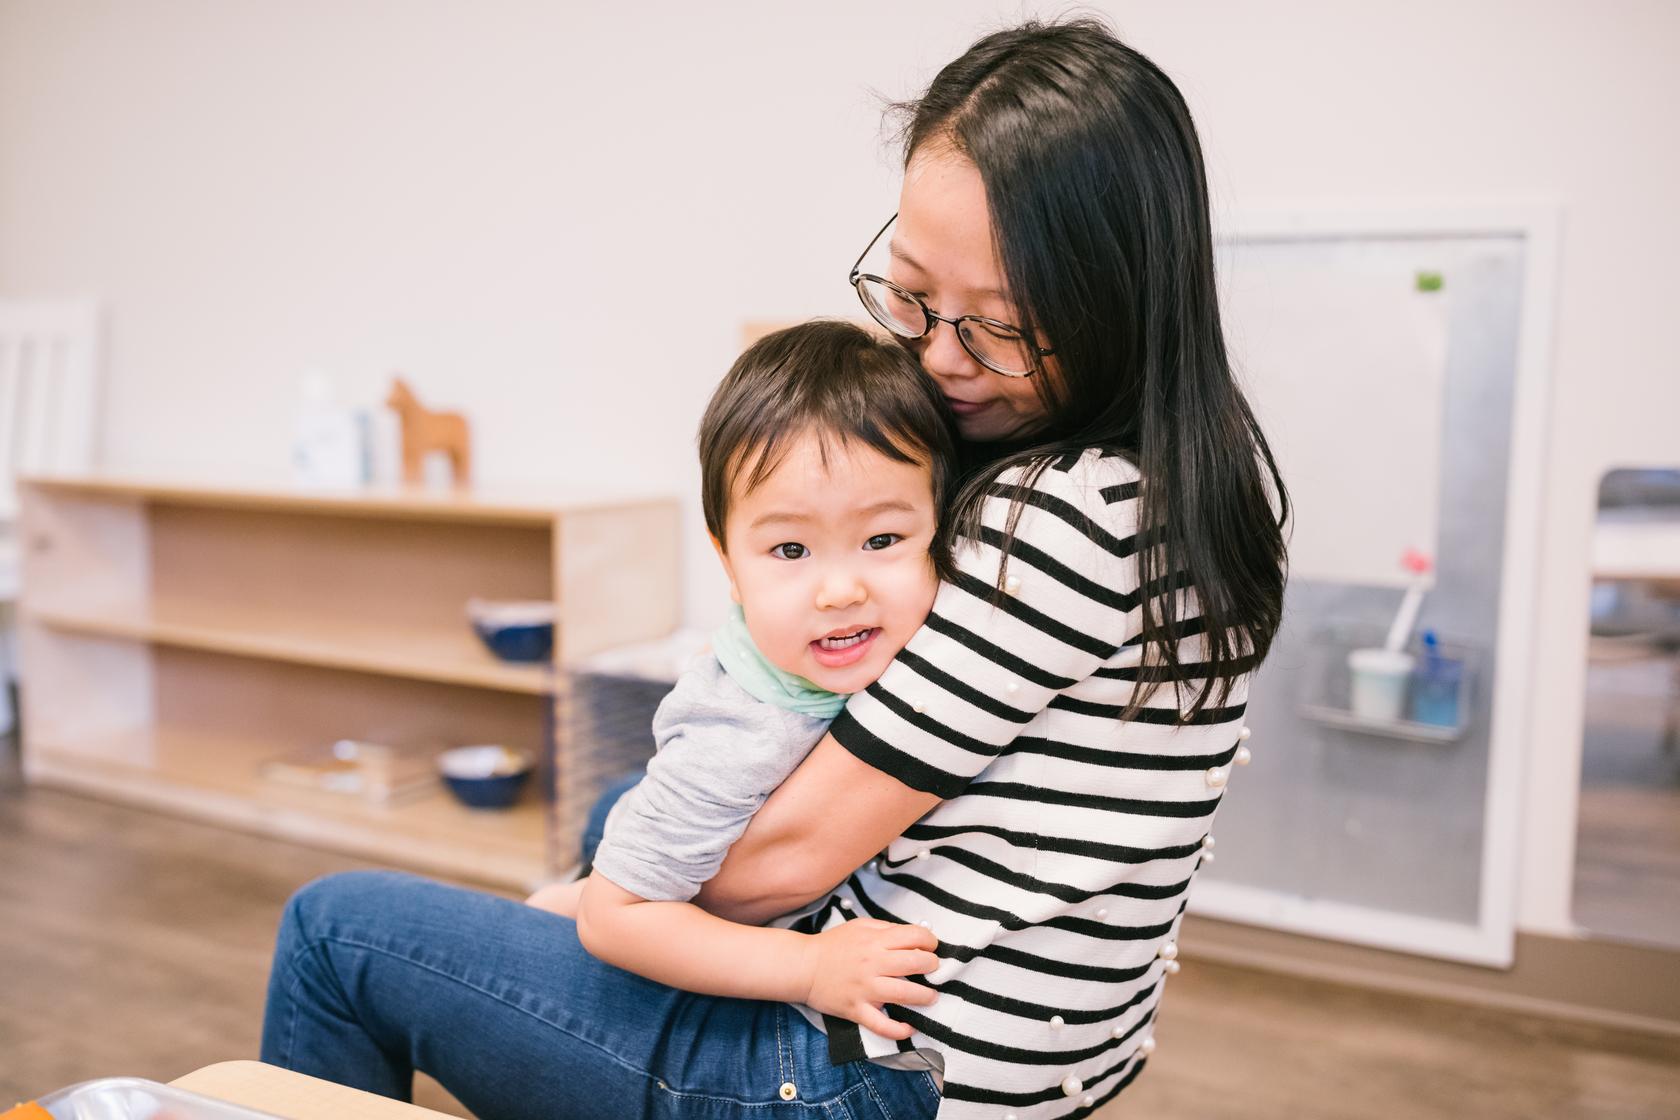 Nurturing guide at Guidepost Montessori hugs child